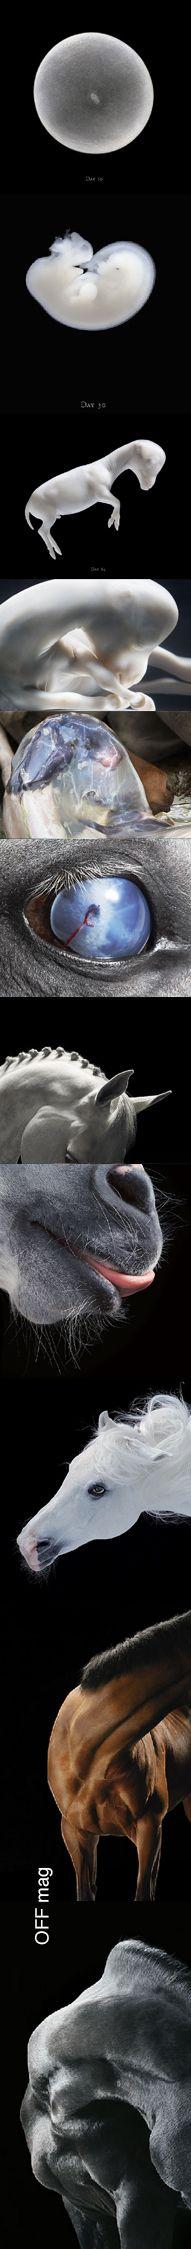 tim flach - horses _________ http://offmag.blogspot.com.es/2012/04/tim-flach-horses.html